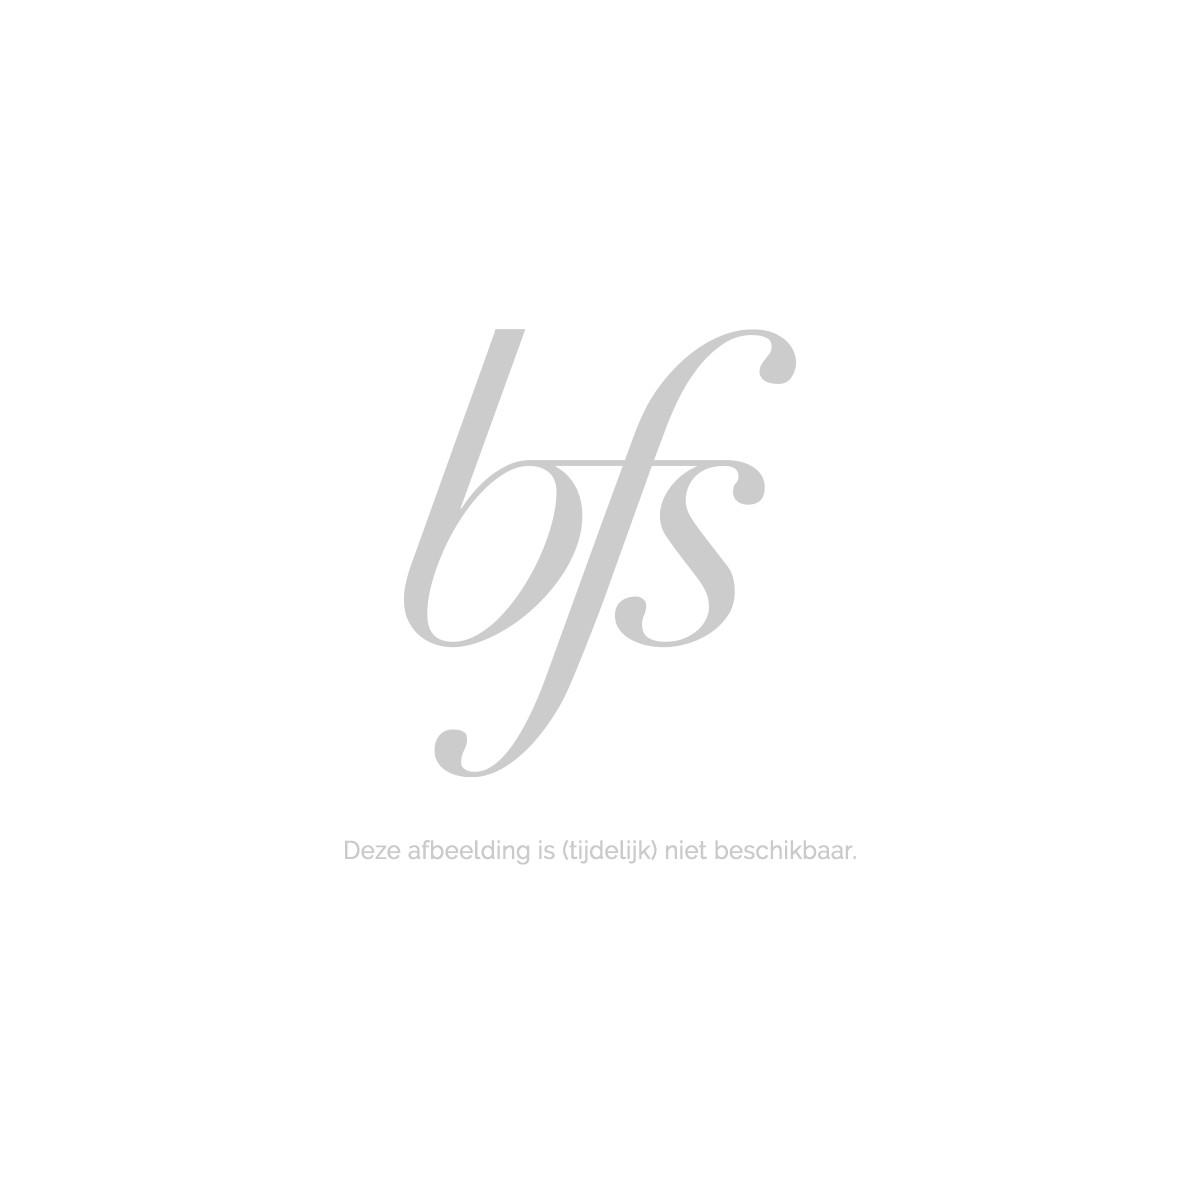 Yves Saint Laurent Black Opium Glowing Eau De Toilette Spray 50 Ml